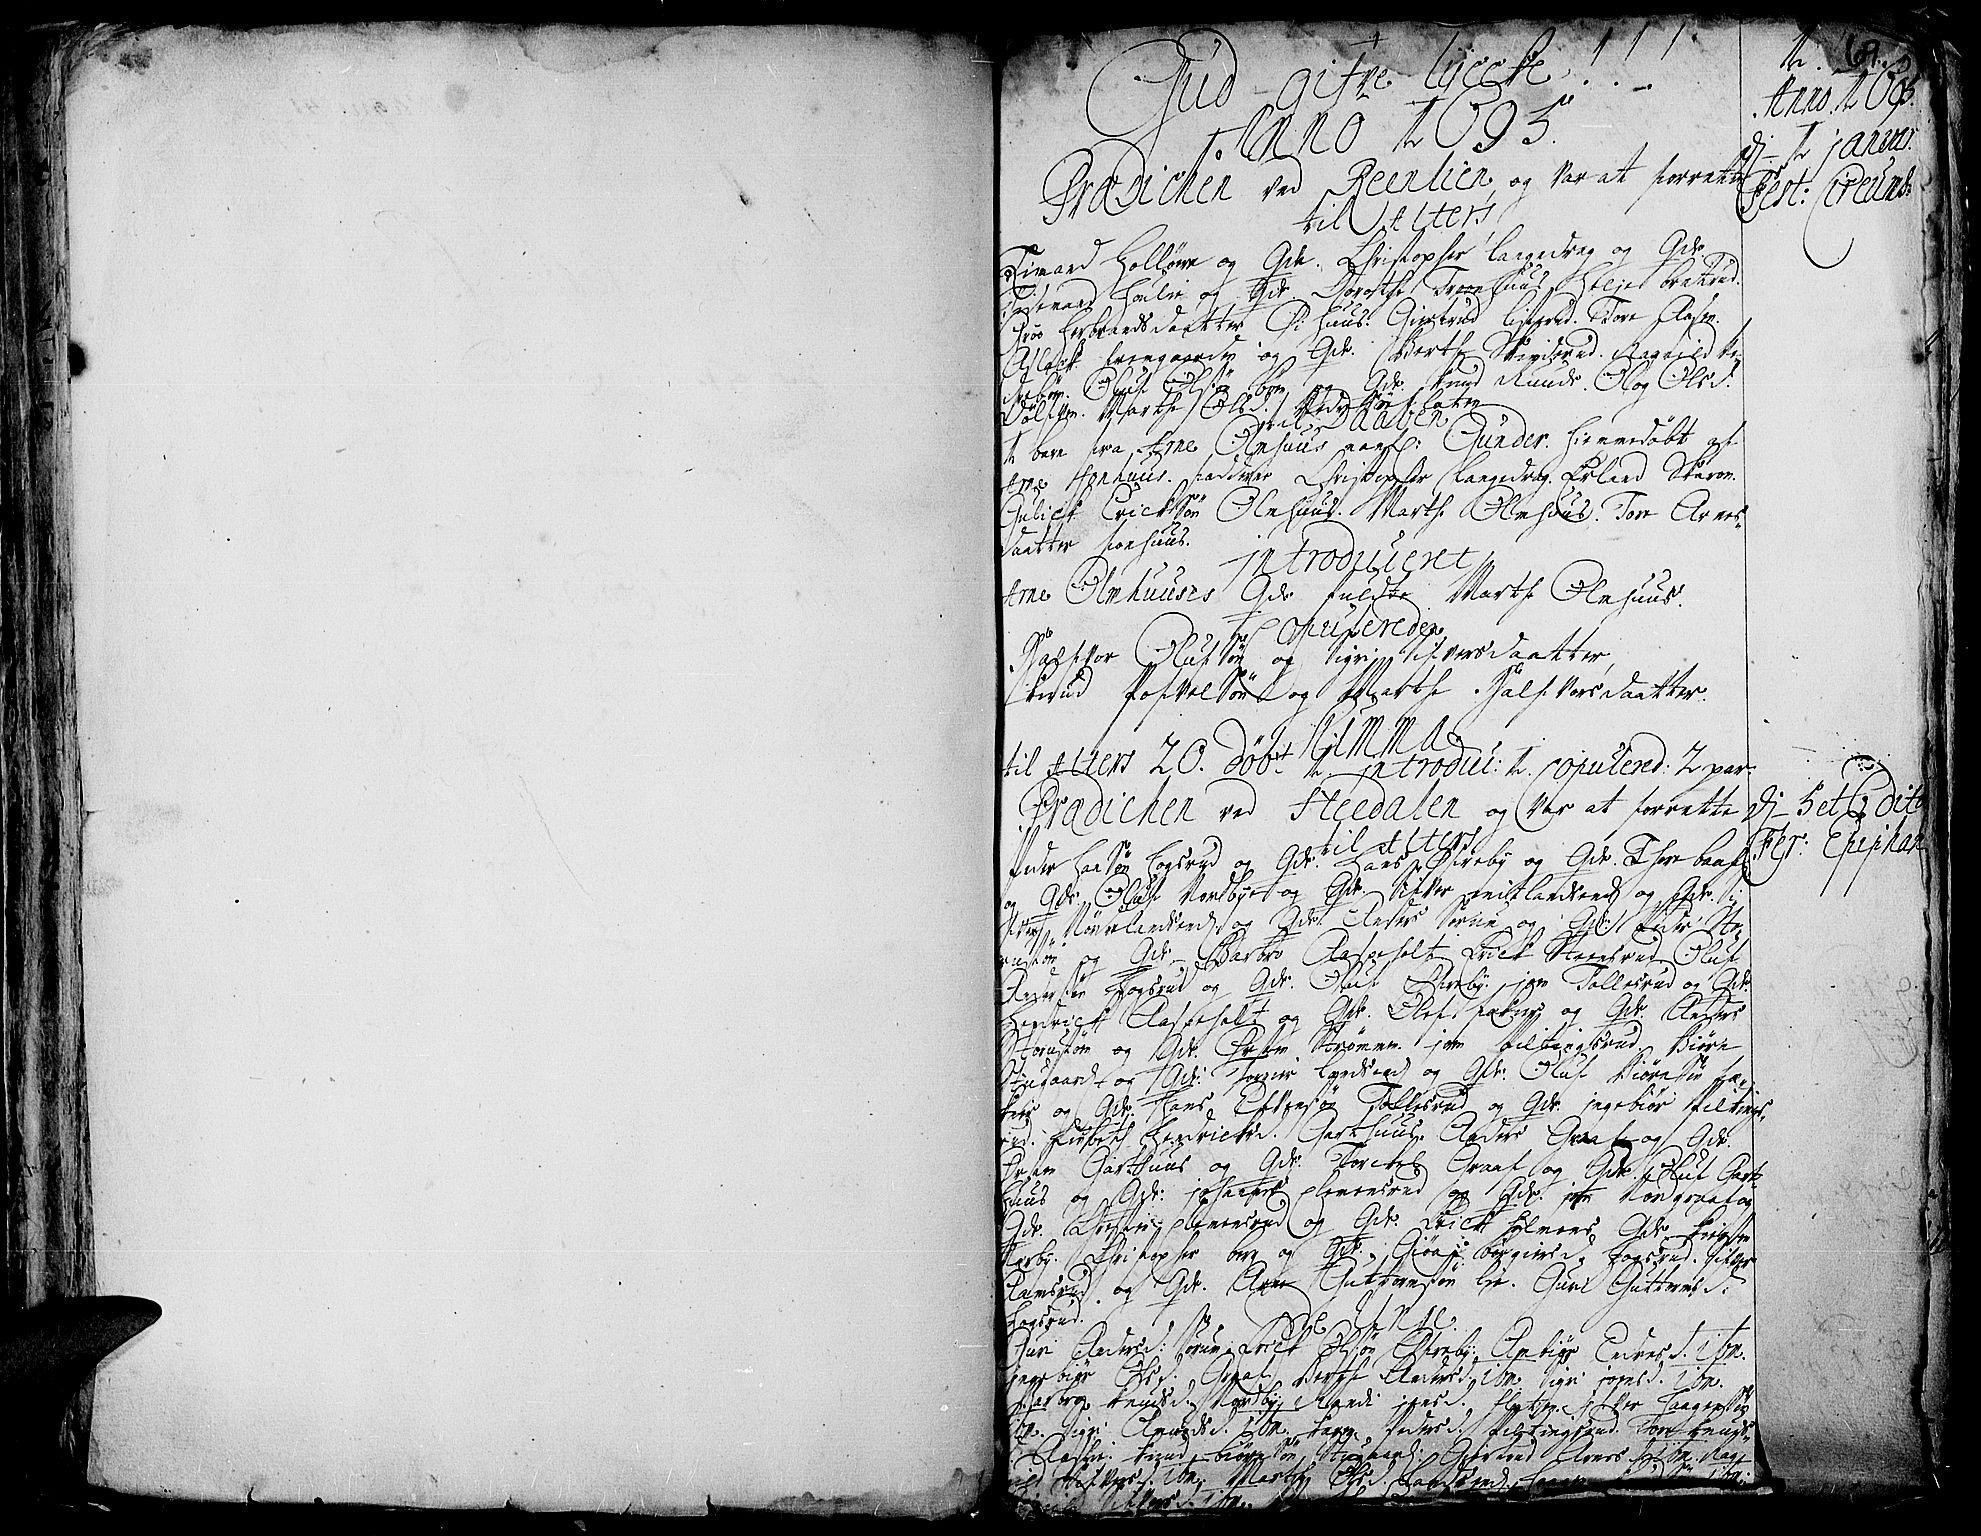 SAH, Aurdal prestekontor, Ministerialbok nr. 1-3, 1692-1730, s. 69